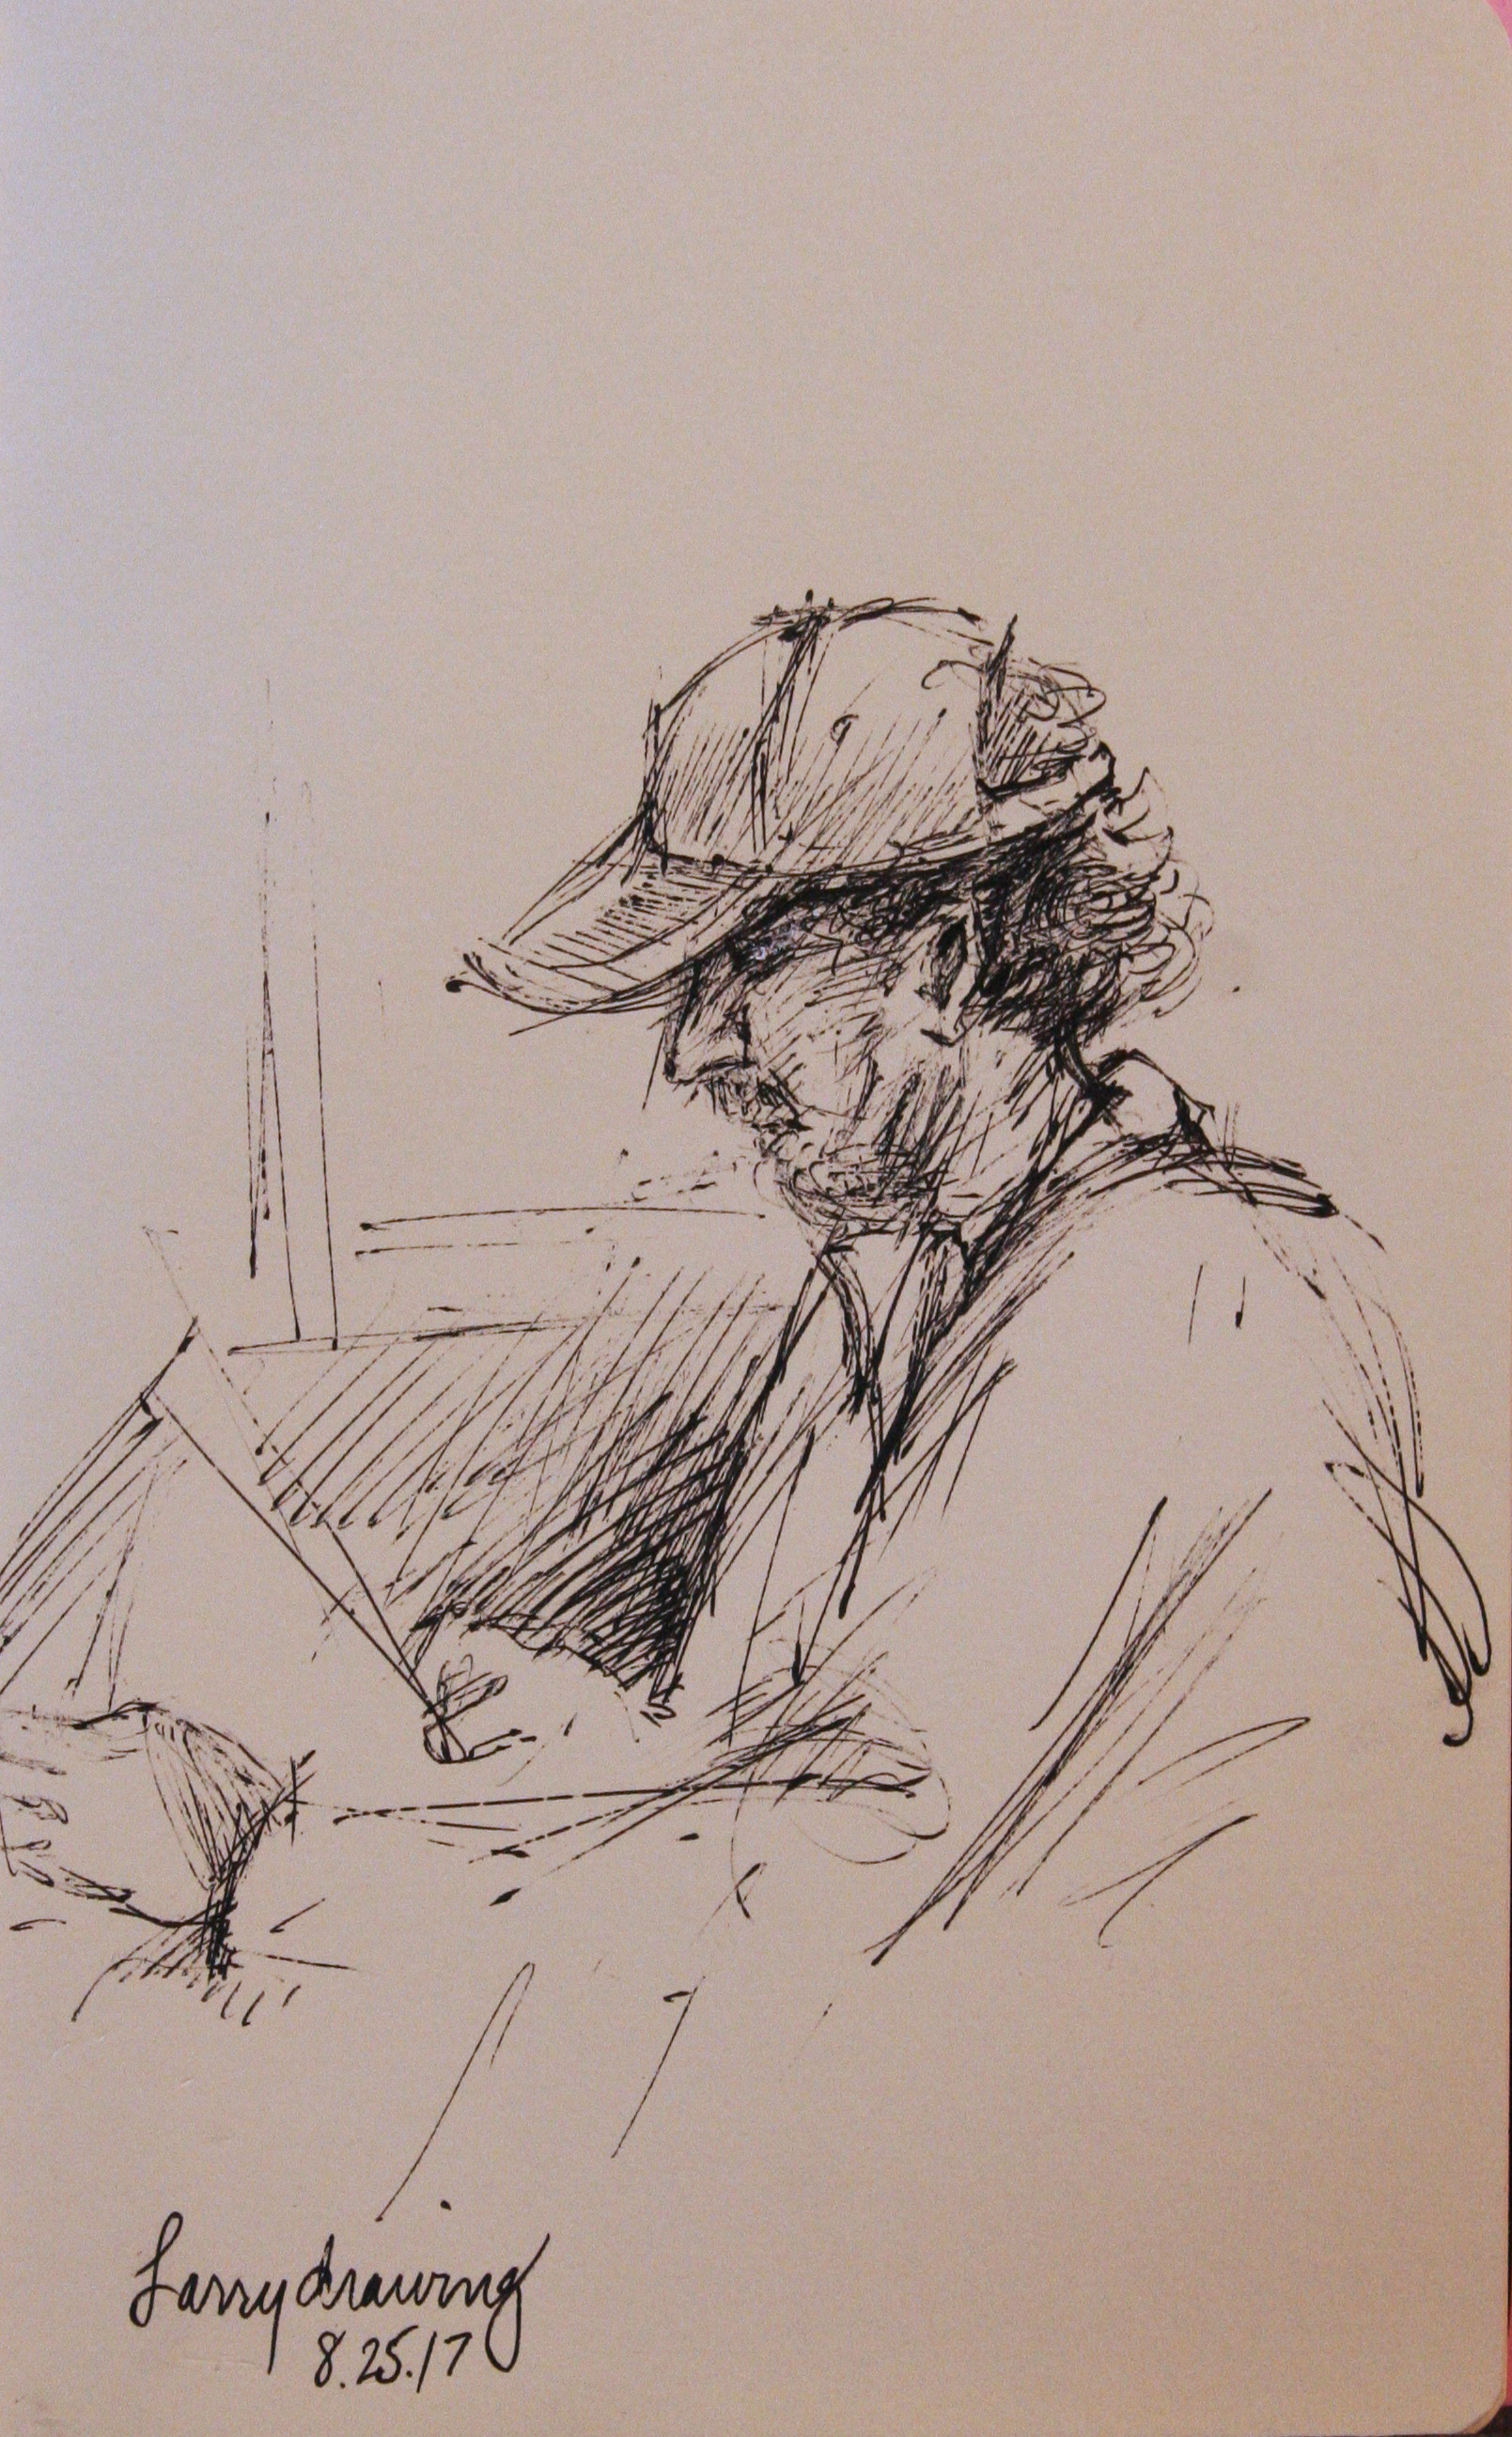 Nancy Lick did this sketch of Larry Zuzik drawing John Troxell.